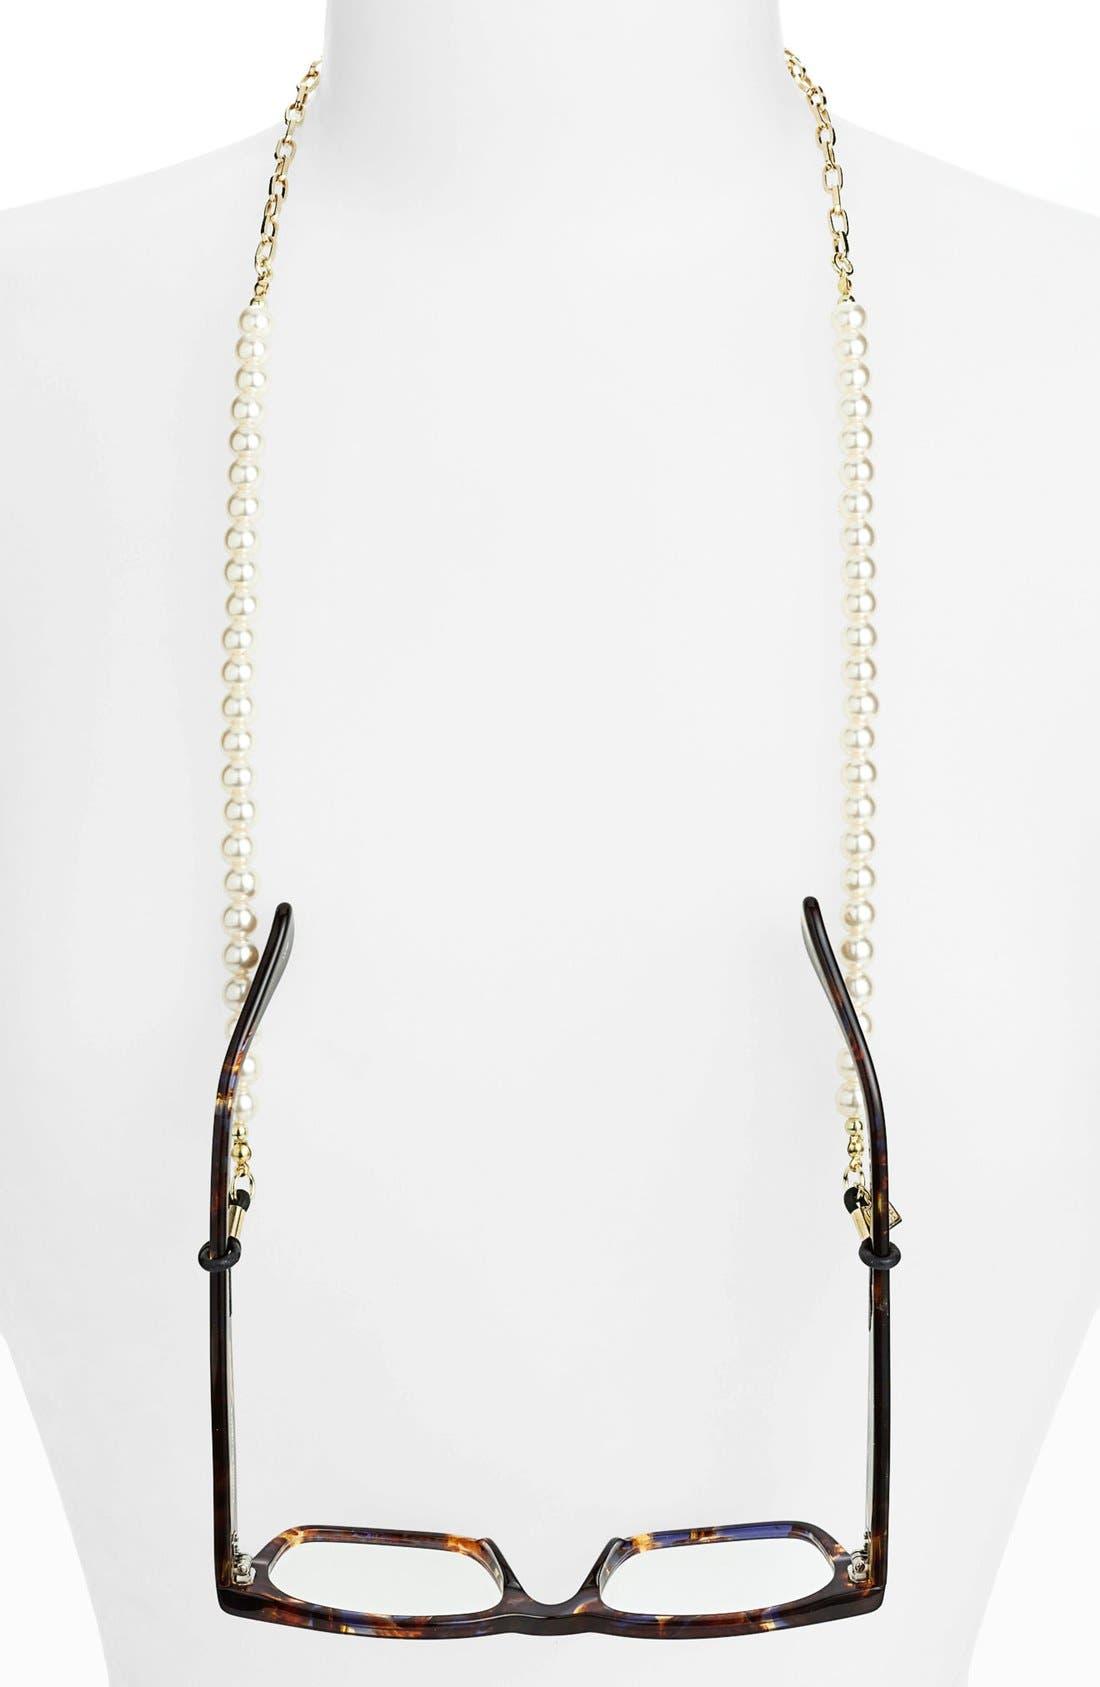 'Pearls' Eyewear Chain,                         Main,                         color, 900